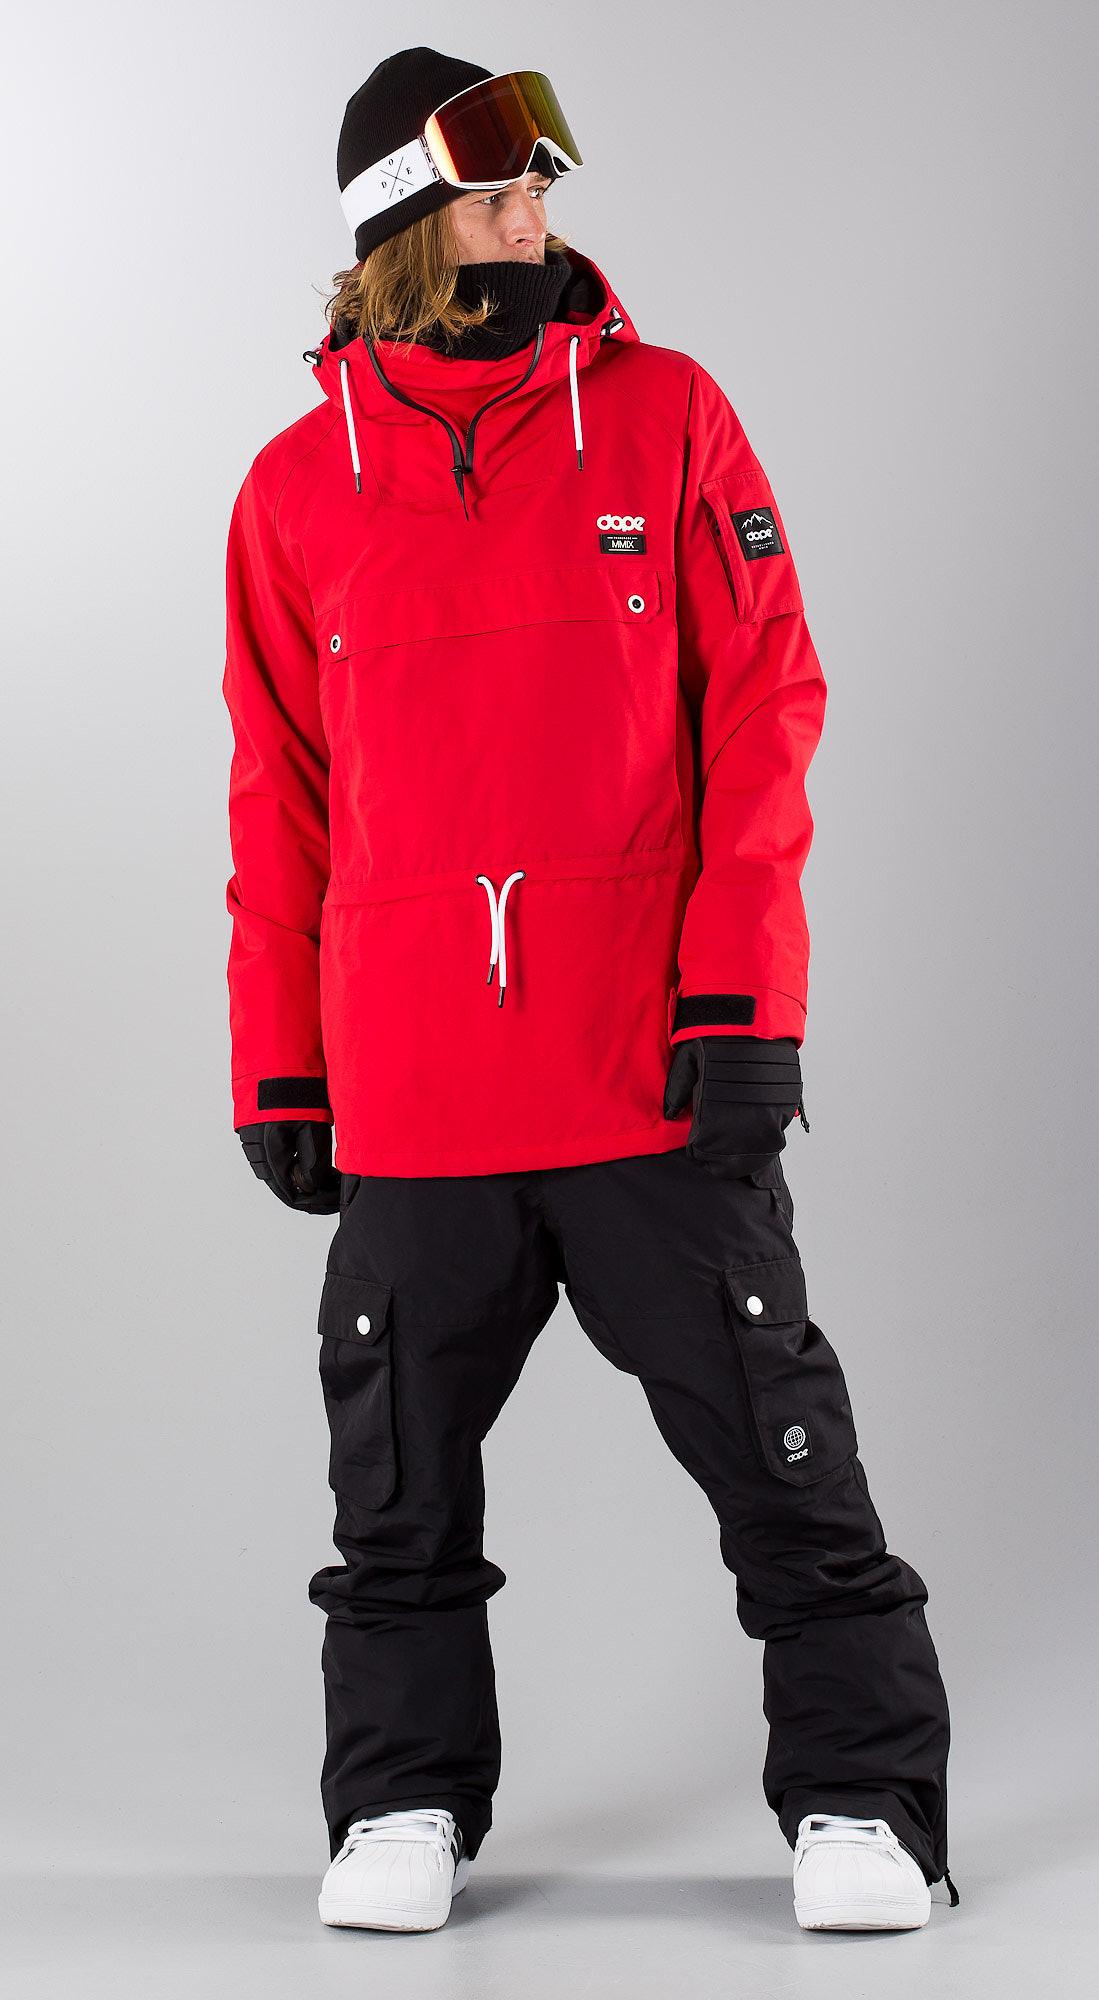 469c72ad Snowboardklær fra Adidas, Dope & Burton - Fri frakt! - Ridestore.no